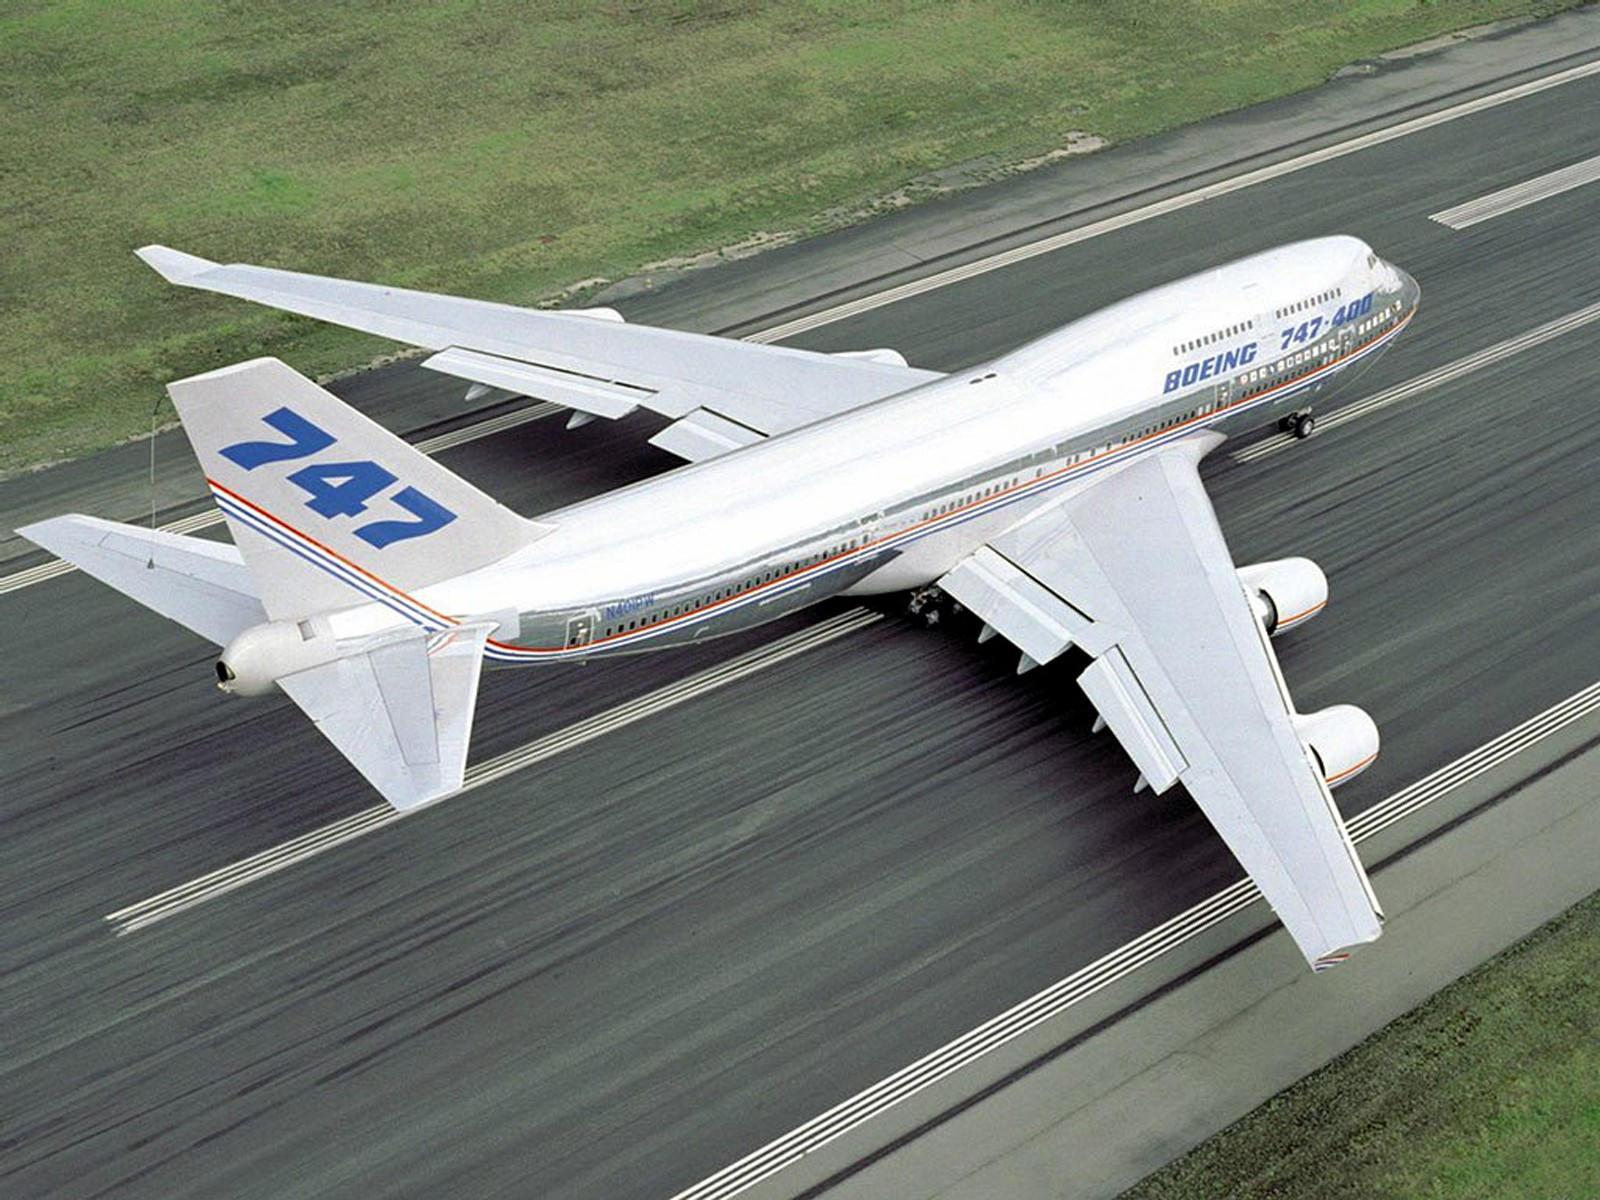 Самолёт Boeing 747 на взлете